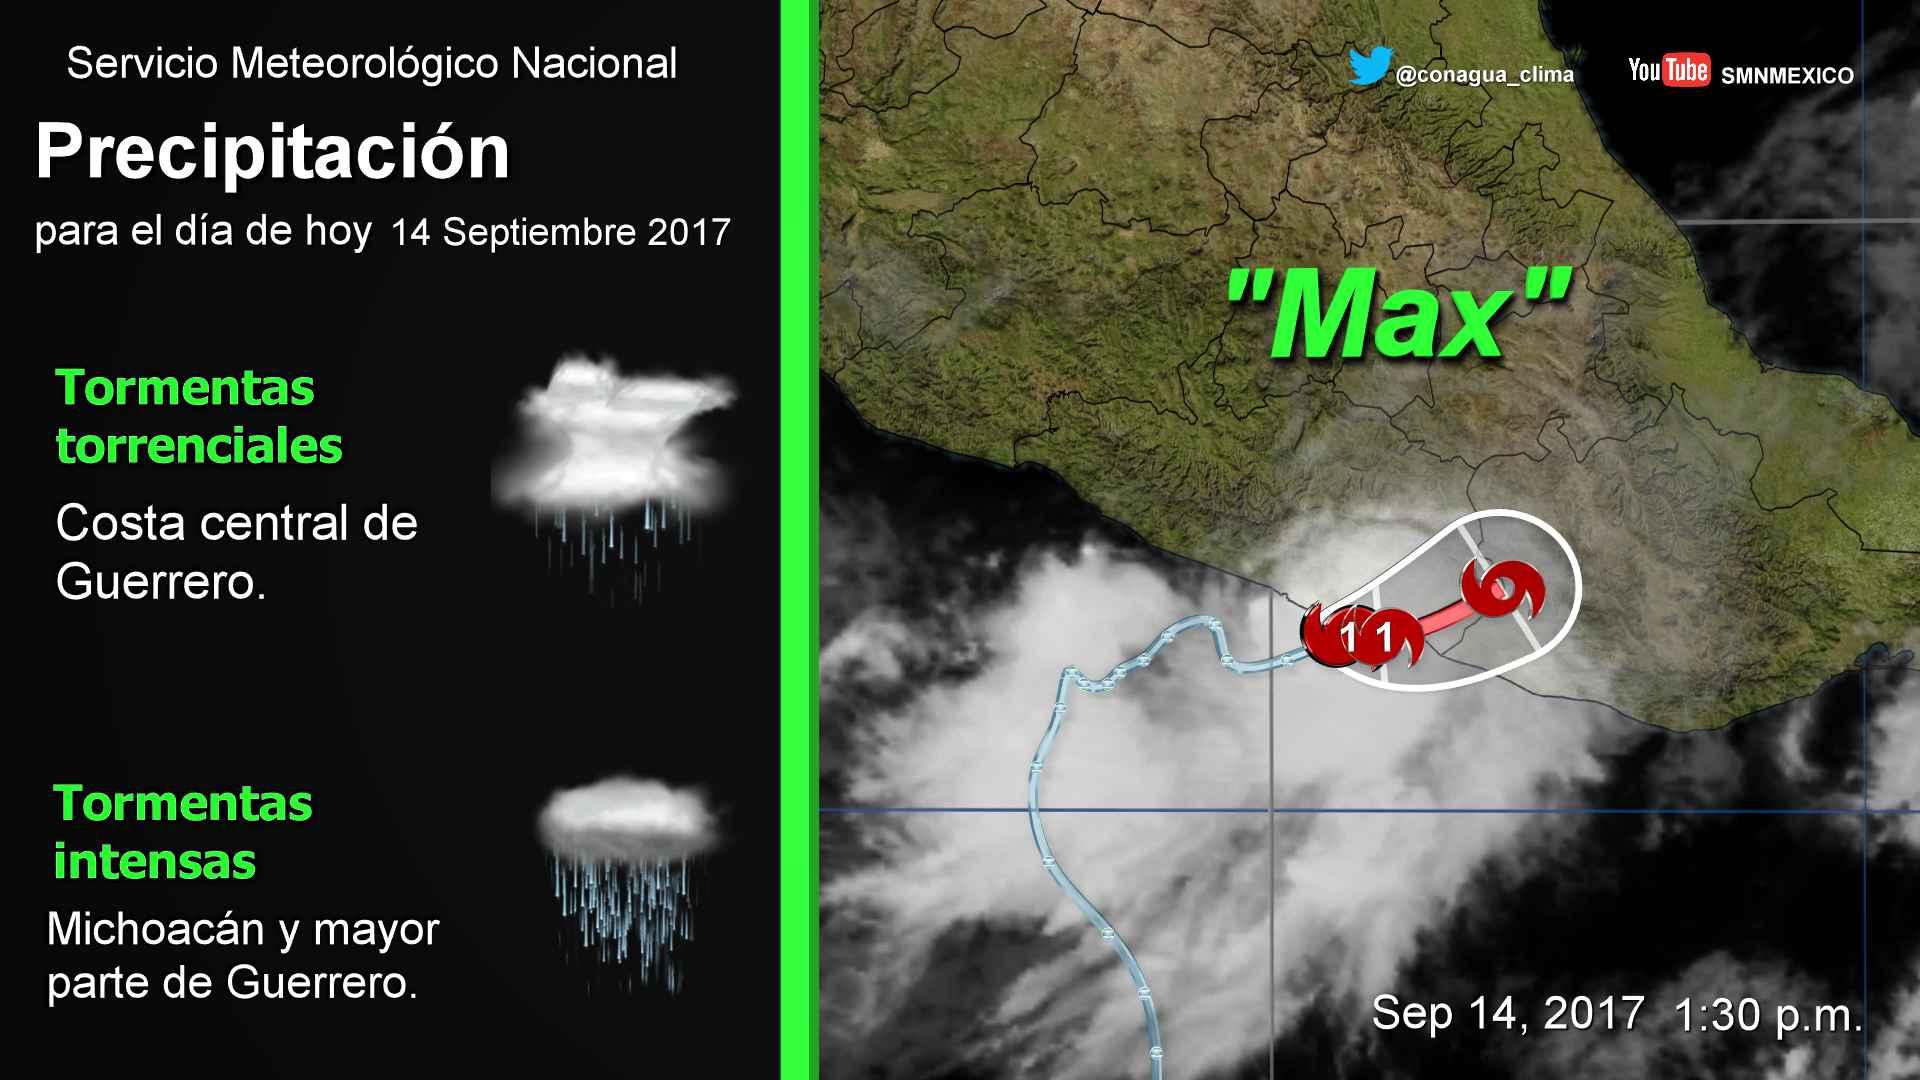 El ojo del huracán Max se localiza a 20 km de la línea de costa de San Marcos, Guerrero